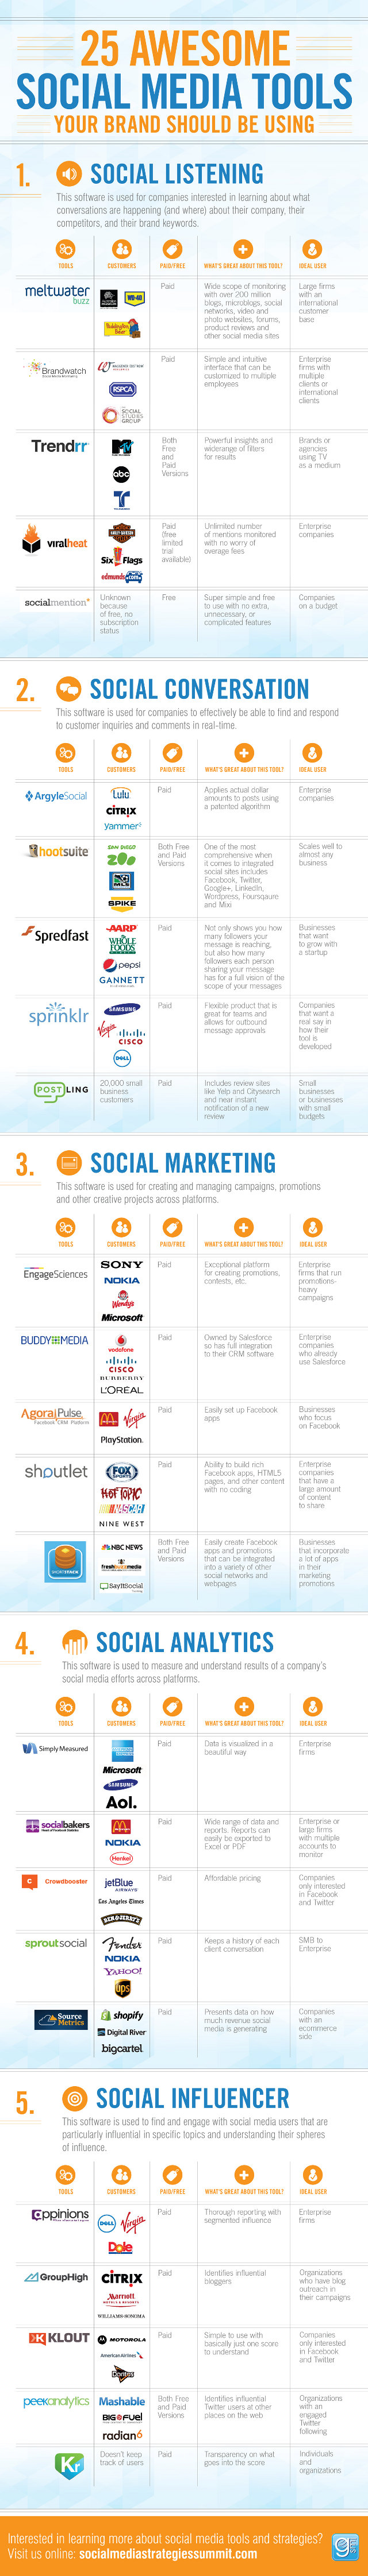 Social-media-monitoring-tools-Infographic-Social-Media-Strategies-Summit